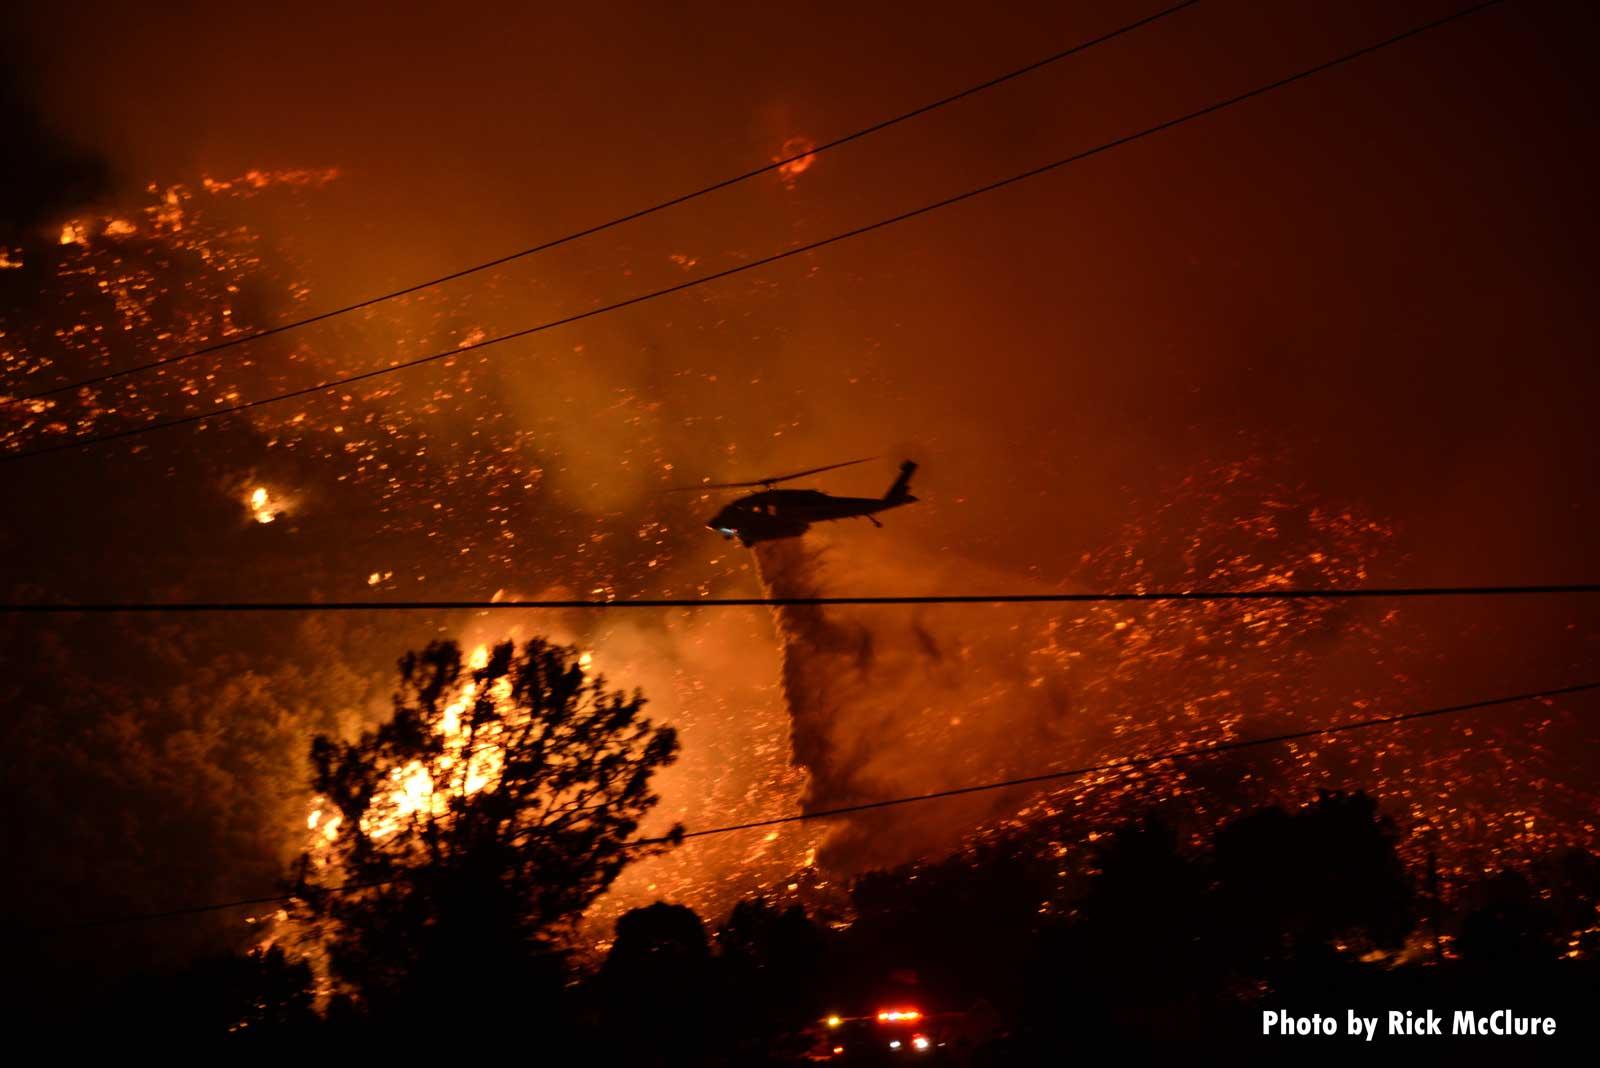 Wildfire burns near Los Angeles